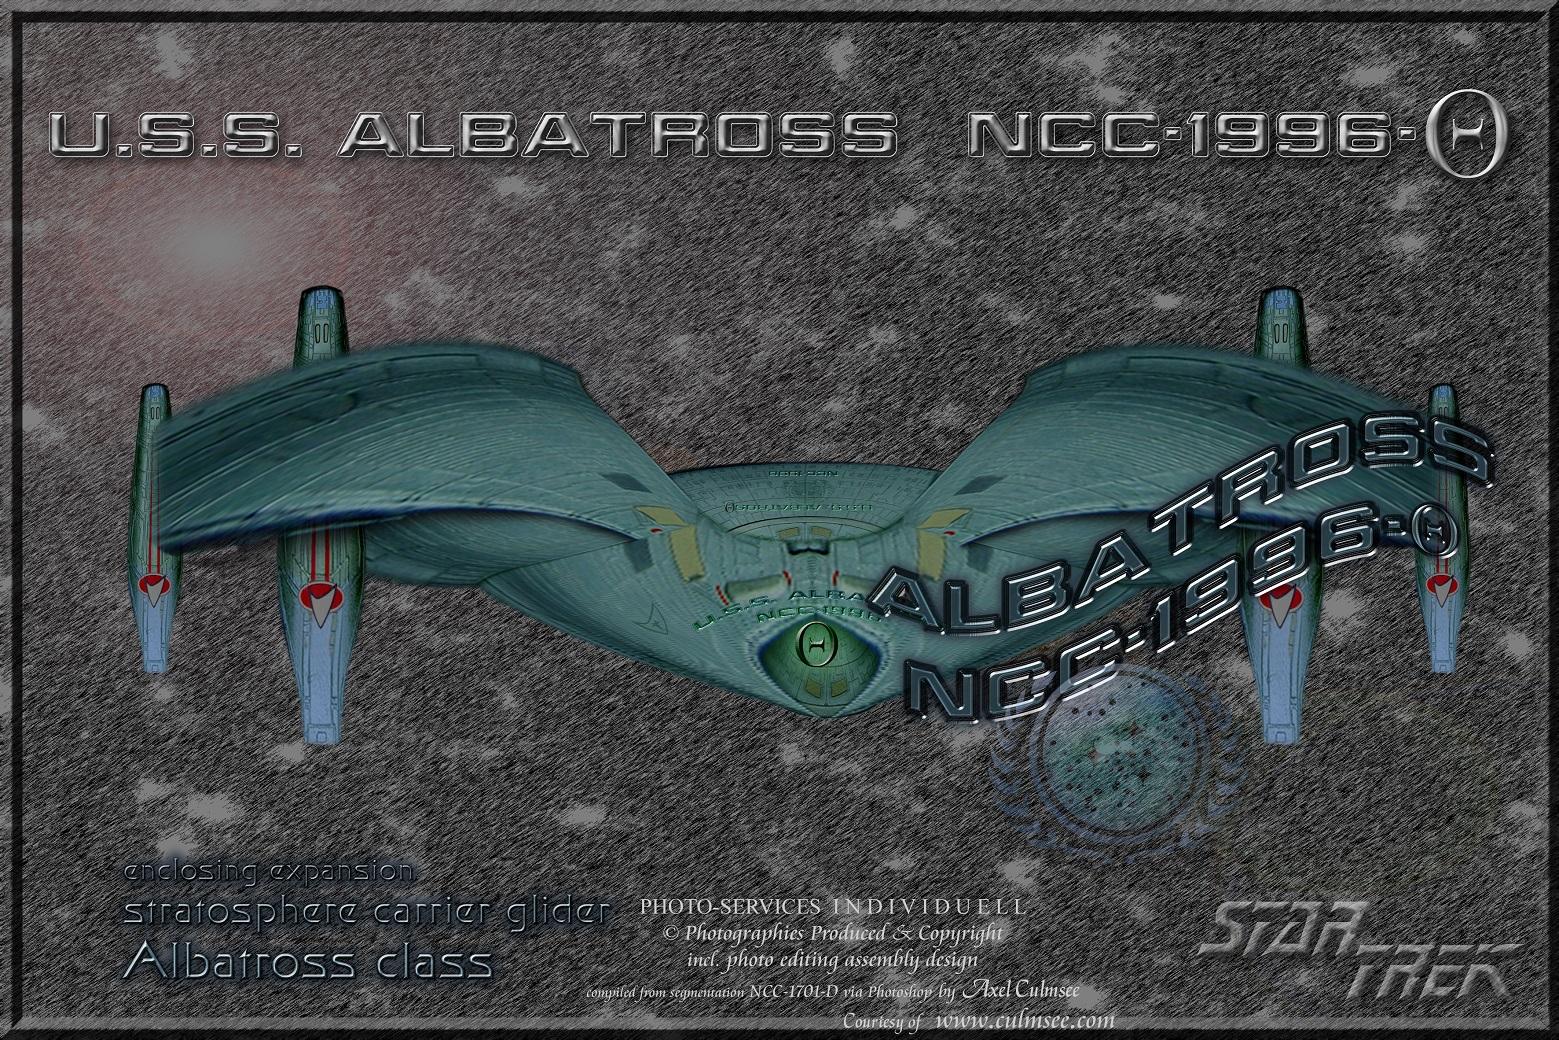 ALBATROSS NCC-1996-Theta Albatross class